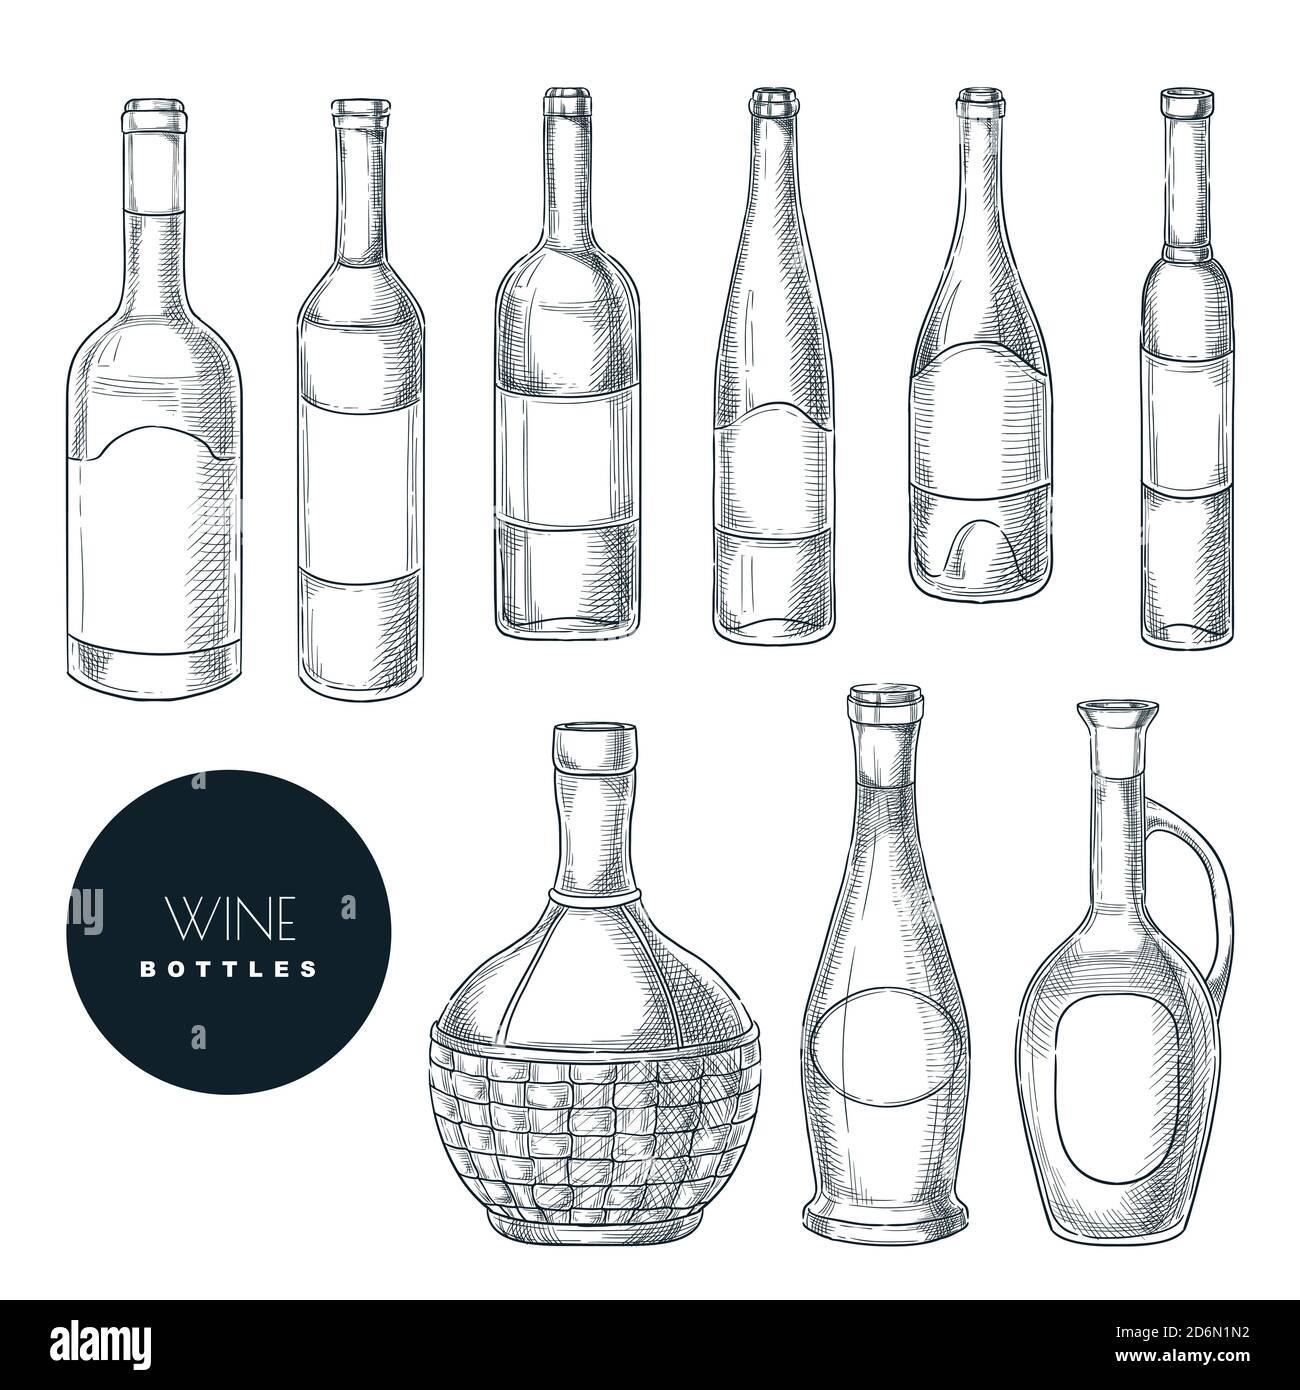 Different shapes of wine bottles. Vector sketch isolated illustration. Wine list or bar menu hand drawn design elements set. Stock Vector